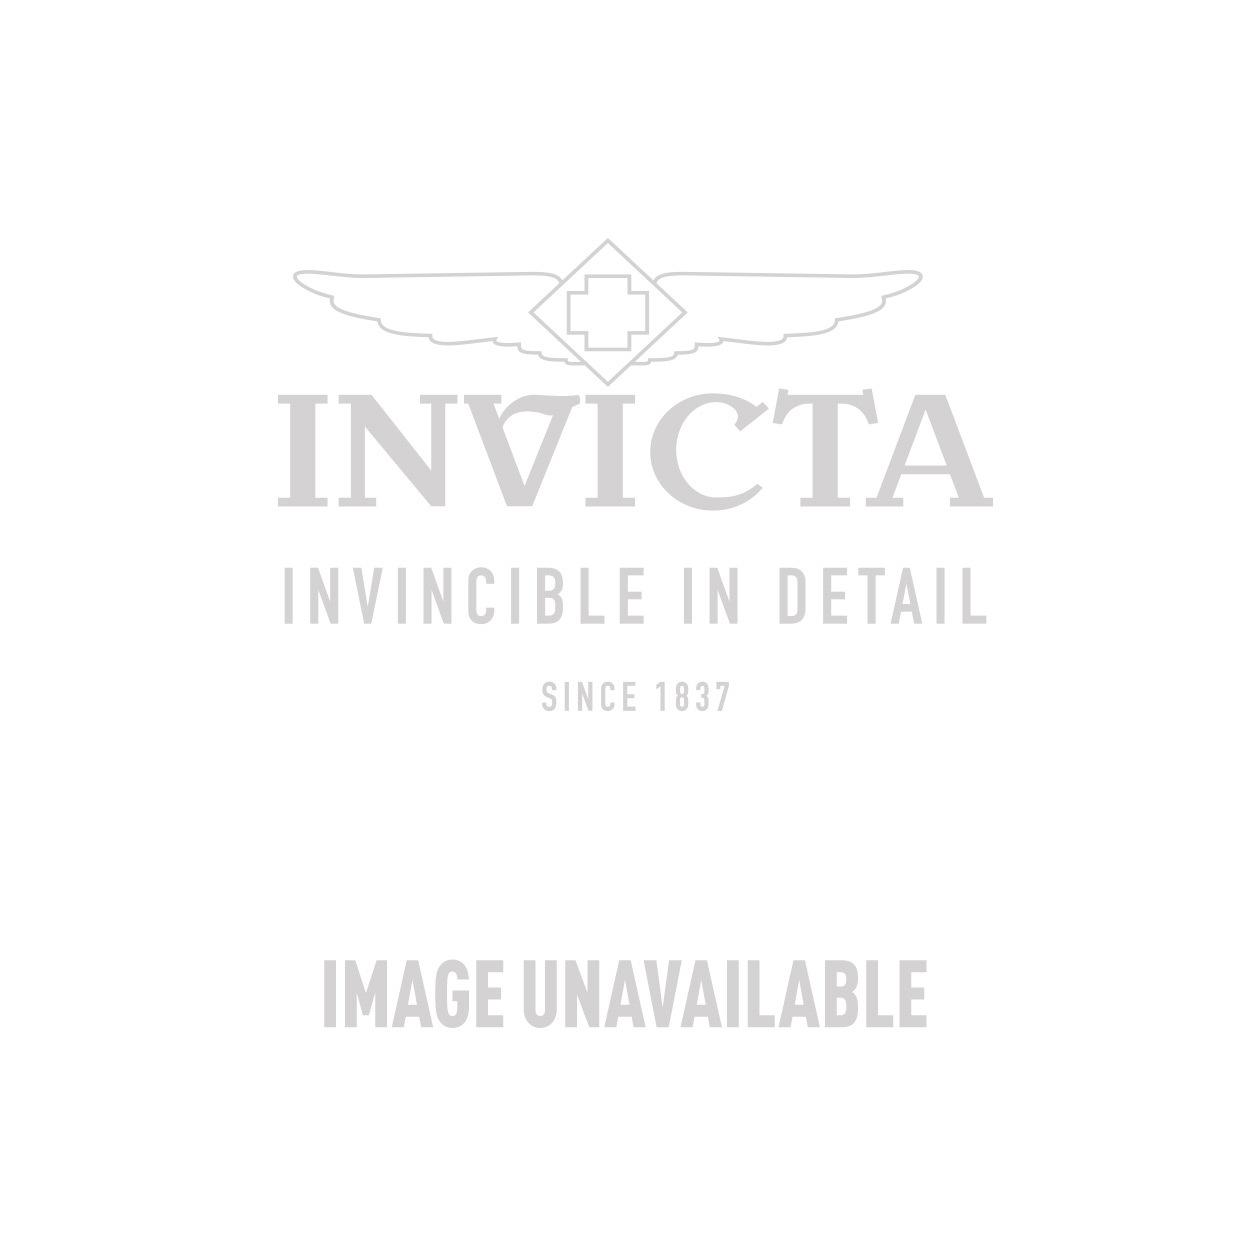 invicta tritnite night glow manual